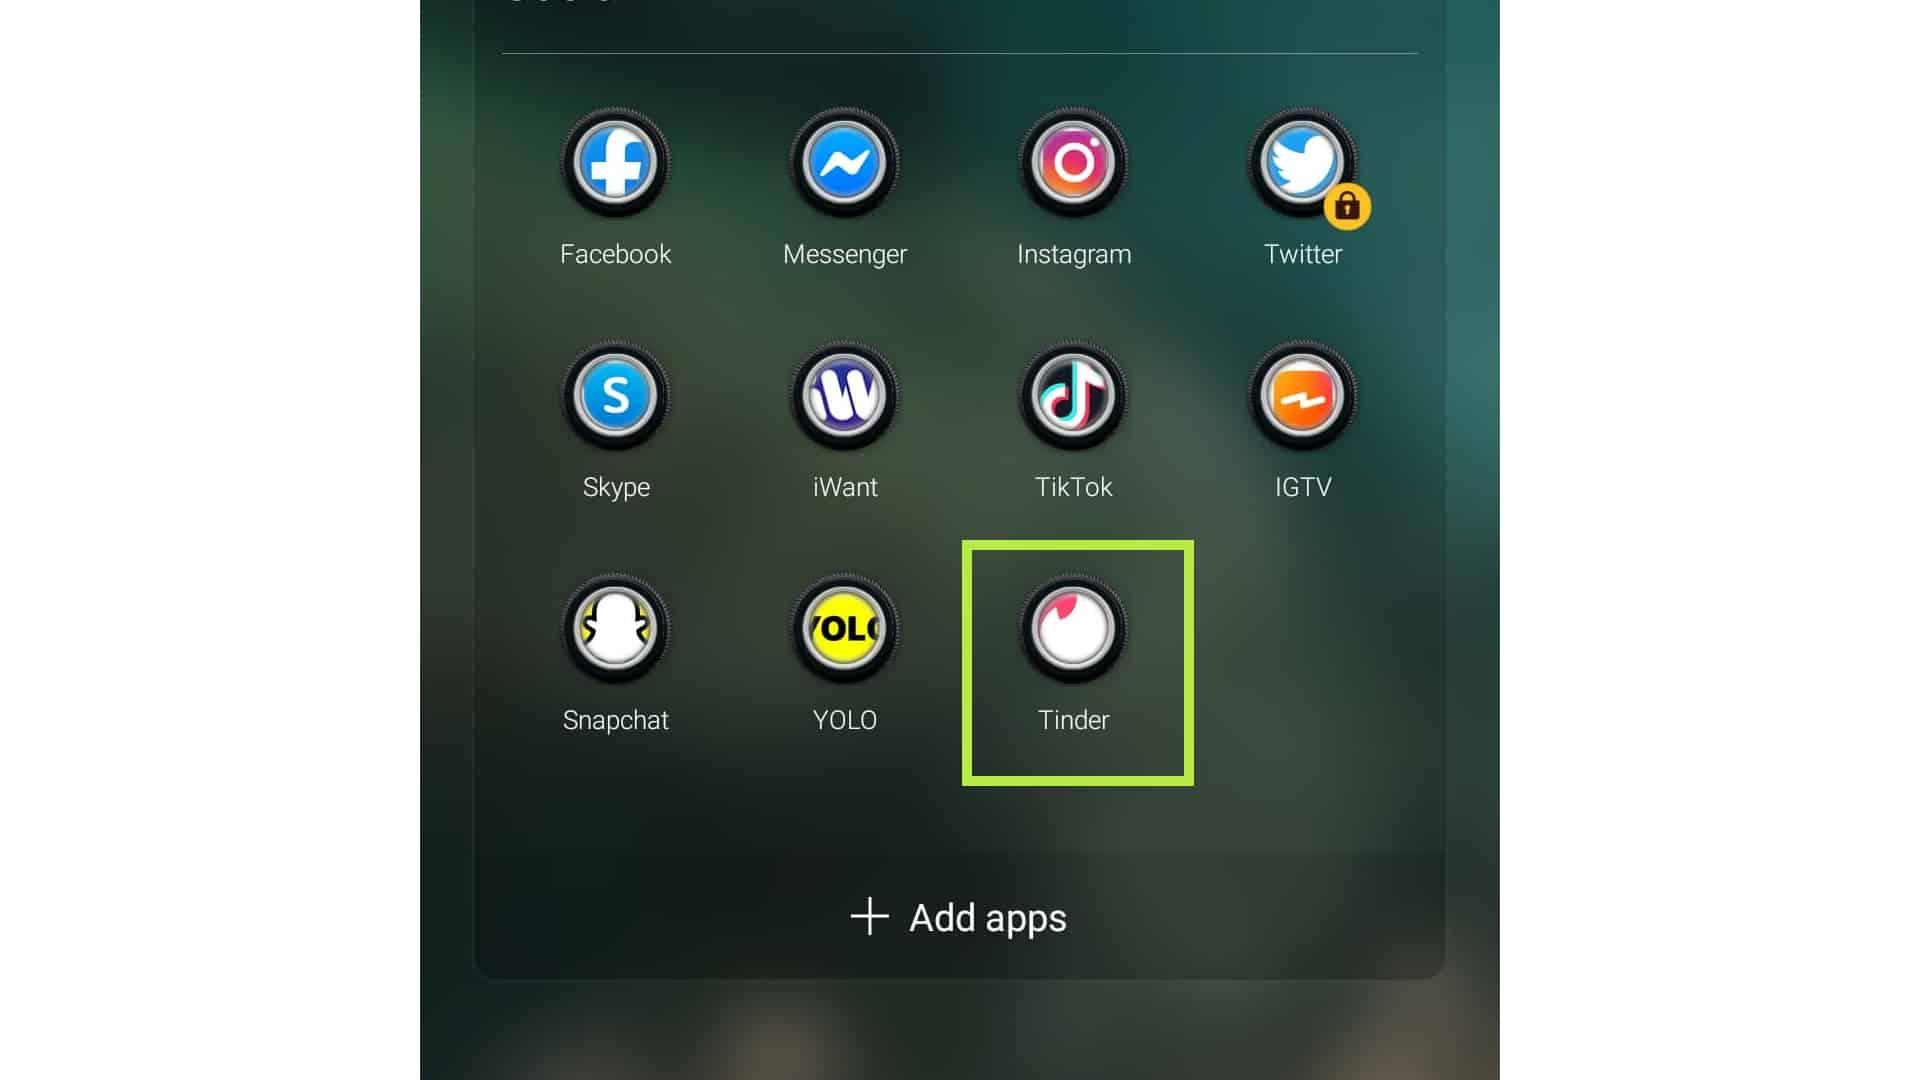 tinder app icon